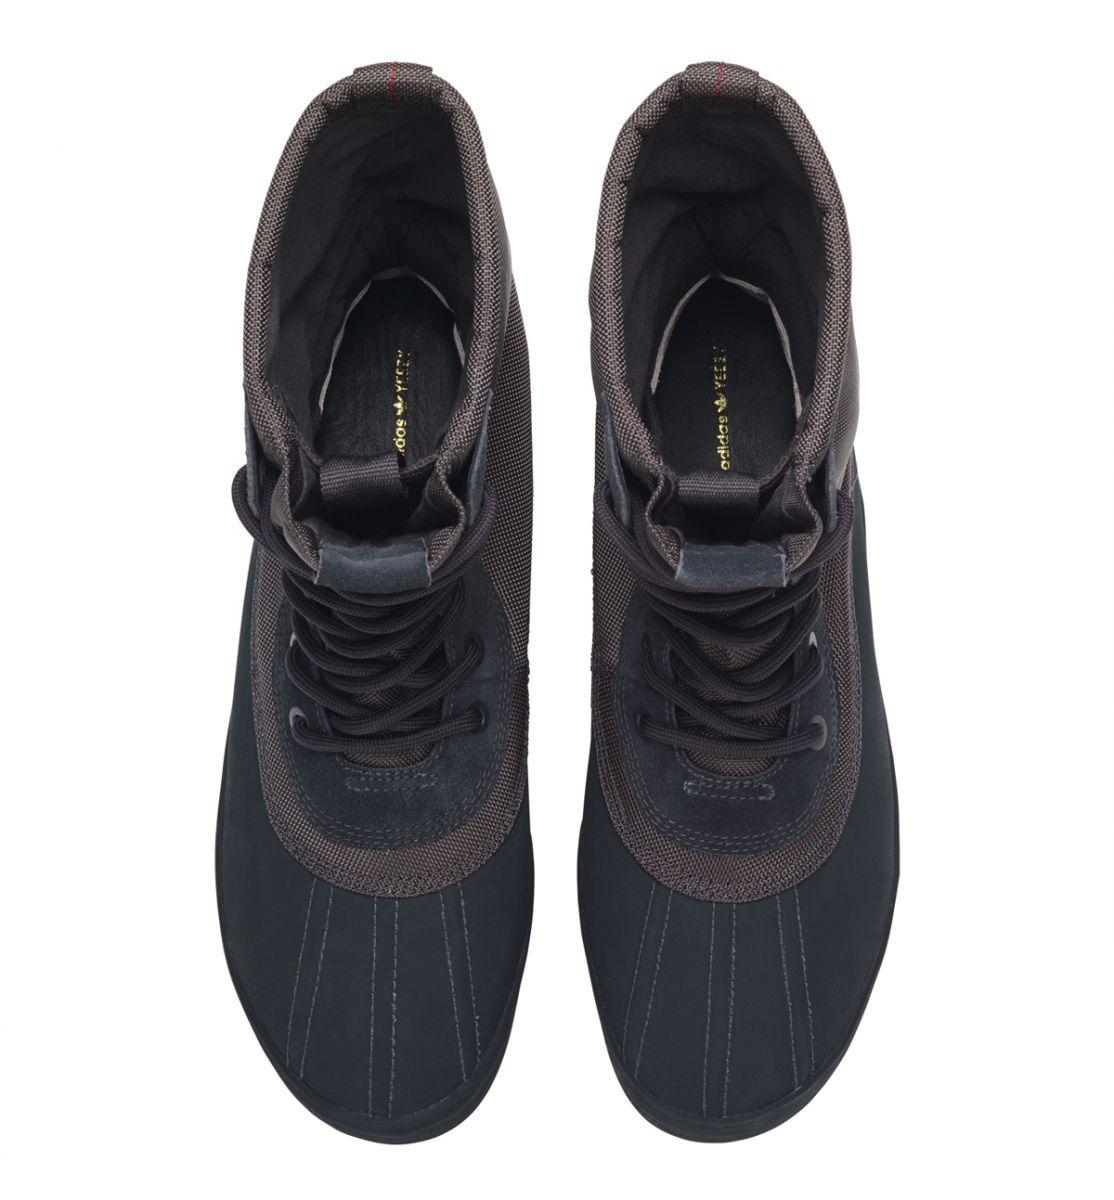 1735b9967228 Where to Buy Adidas Yeezy Season 1